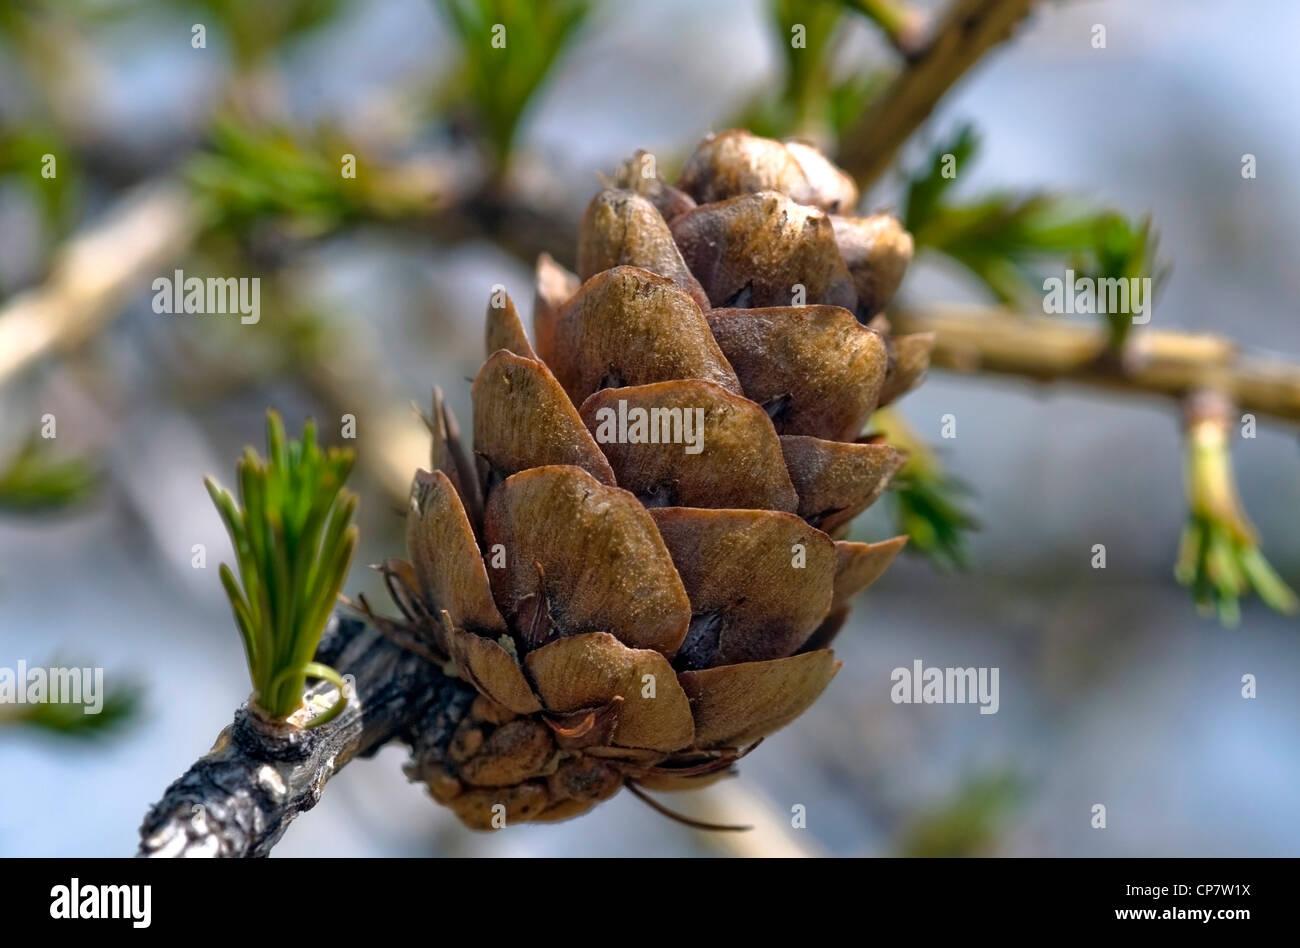 European larch buds; (Larix decidua) closeup - Stock Image